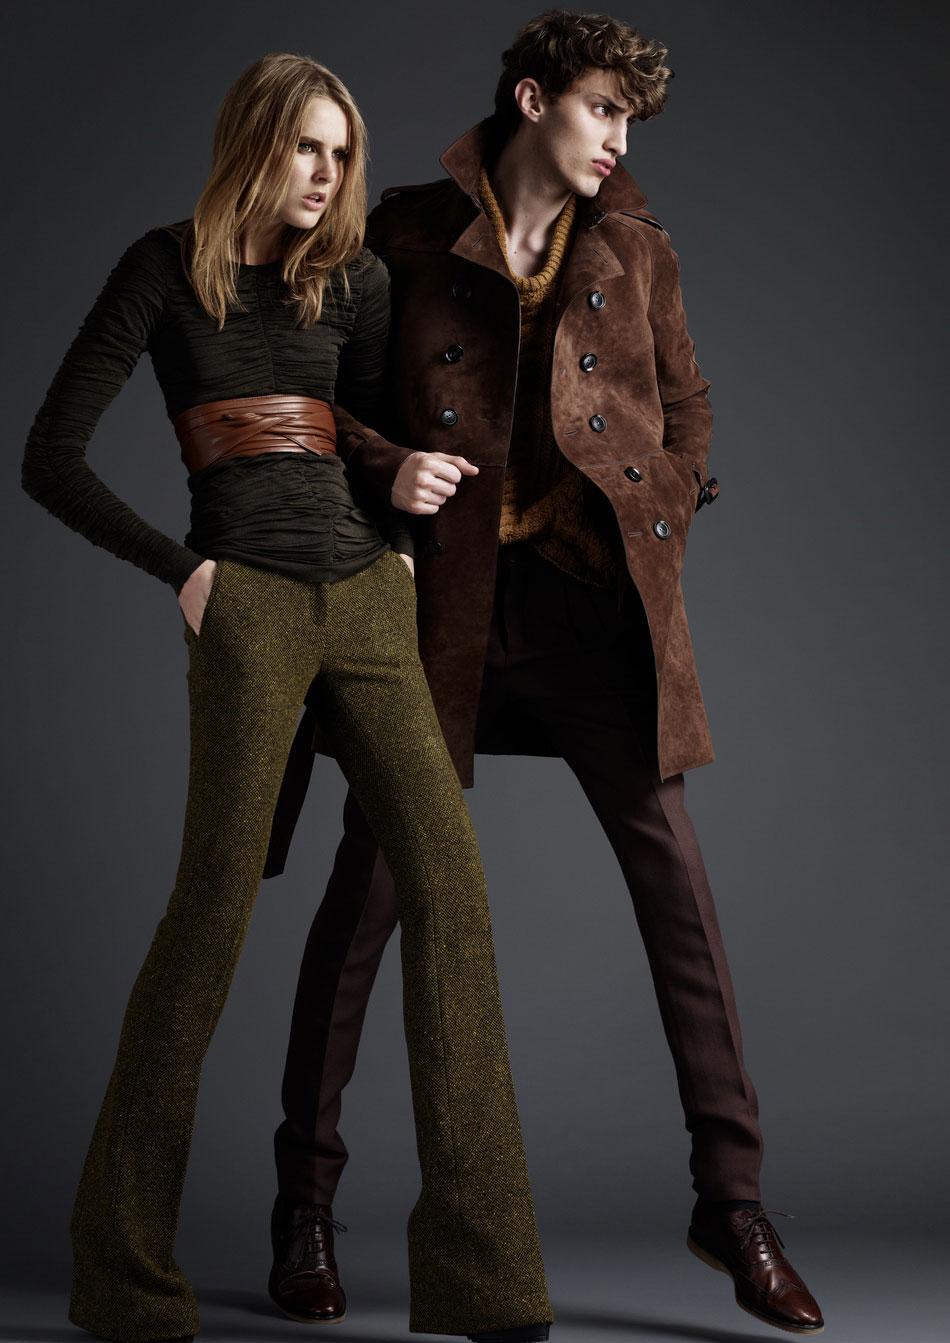 Burberry Prorsum Runway London Fashion Week Aw14: Dandy Bohemian: Burberry Prorsum Menswear Pre-Collection